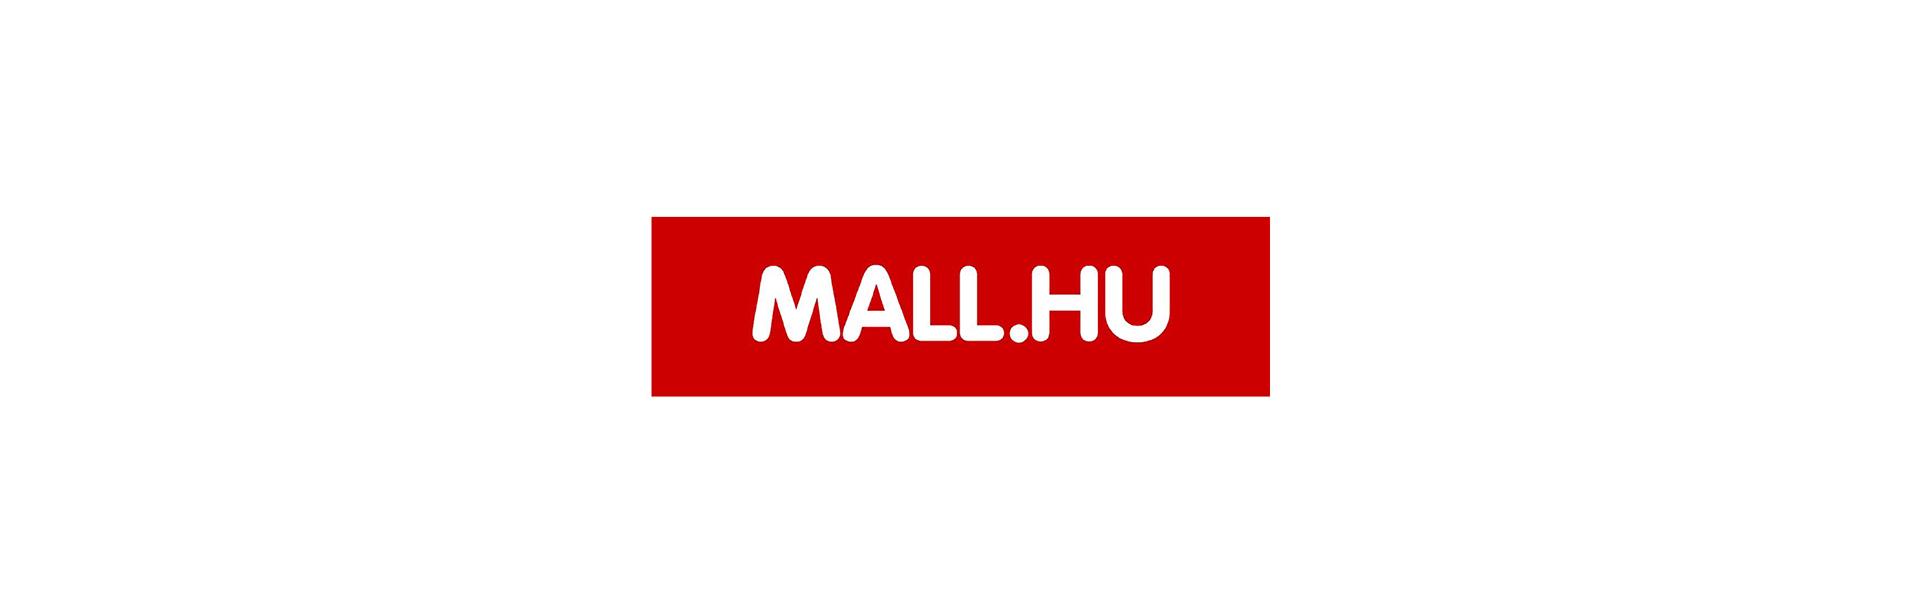 MALL.HU webáruház